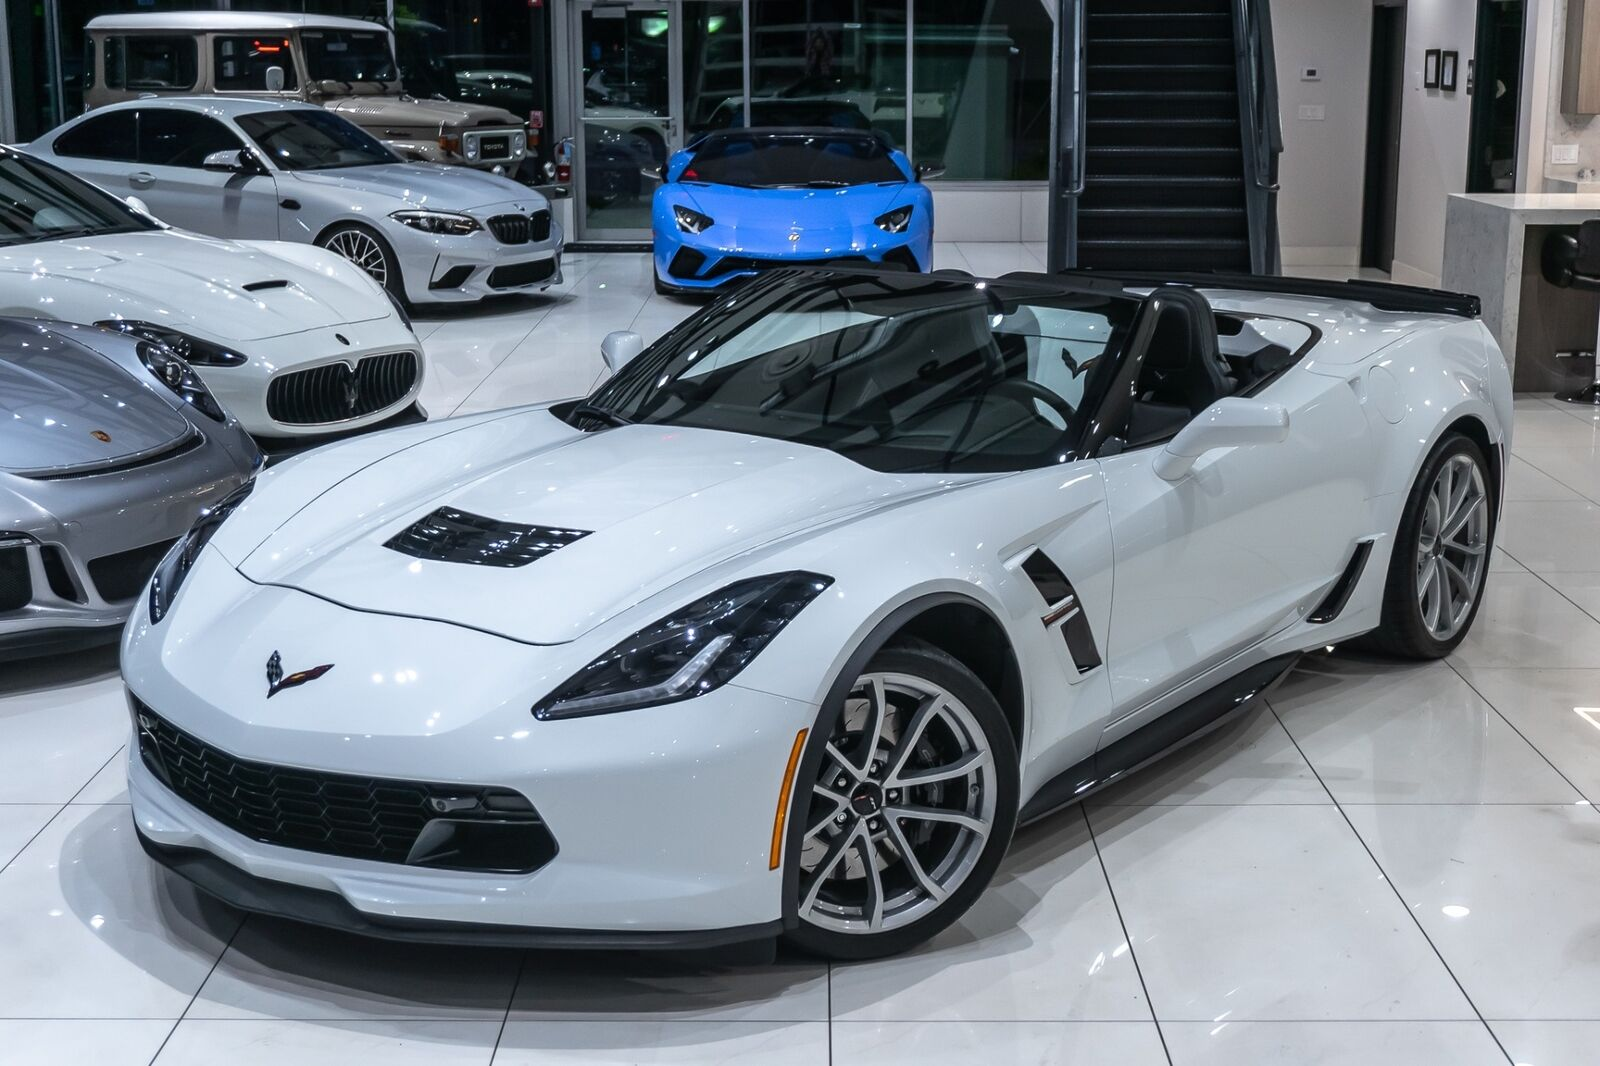 2019 White Chevrolet Corvette Convertible 2LT | C7 Corvette Photo 4